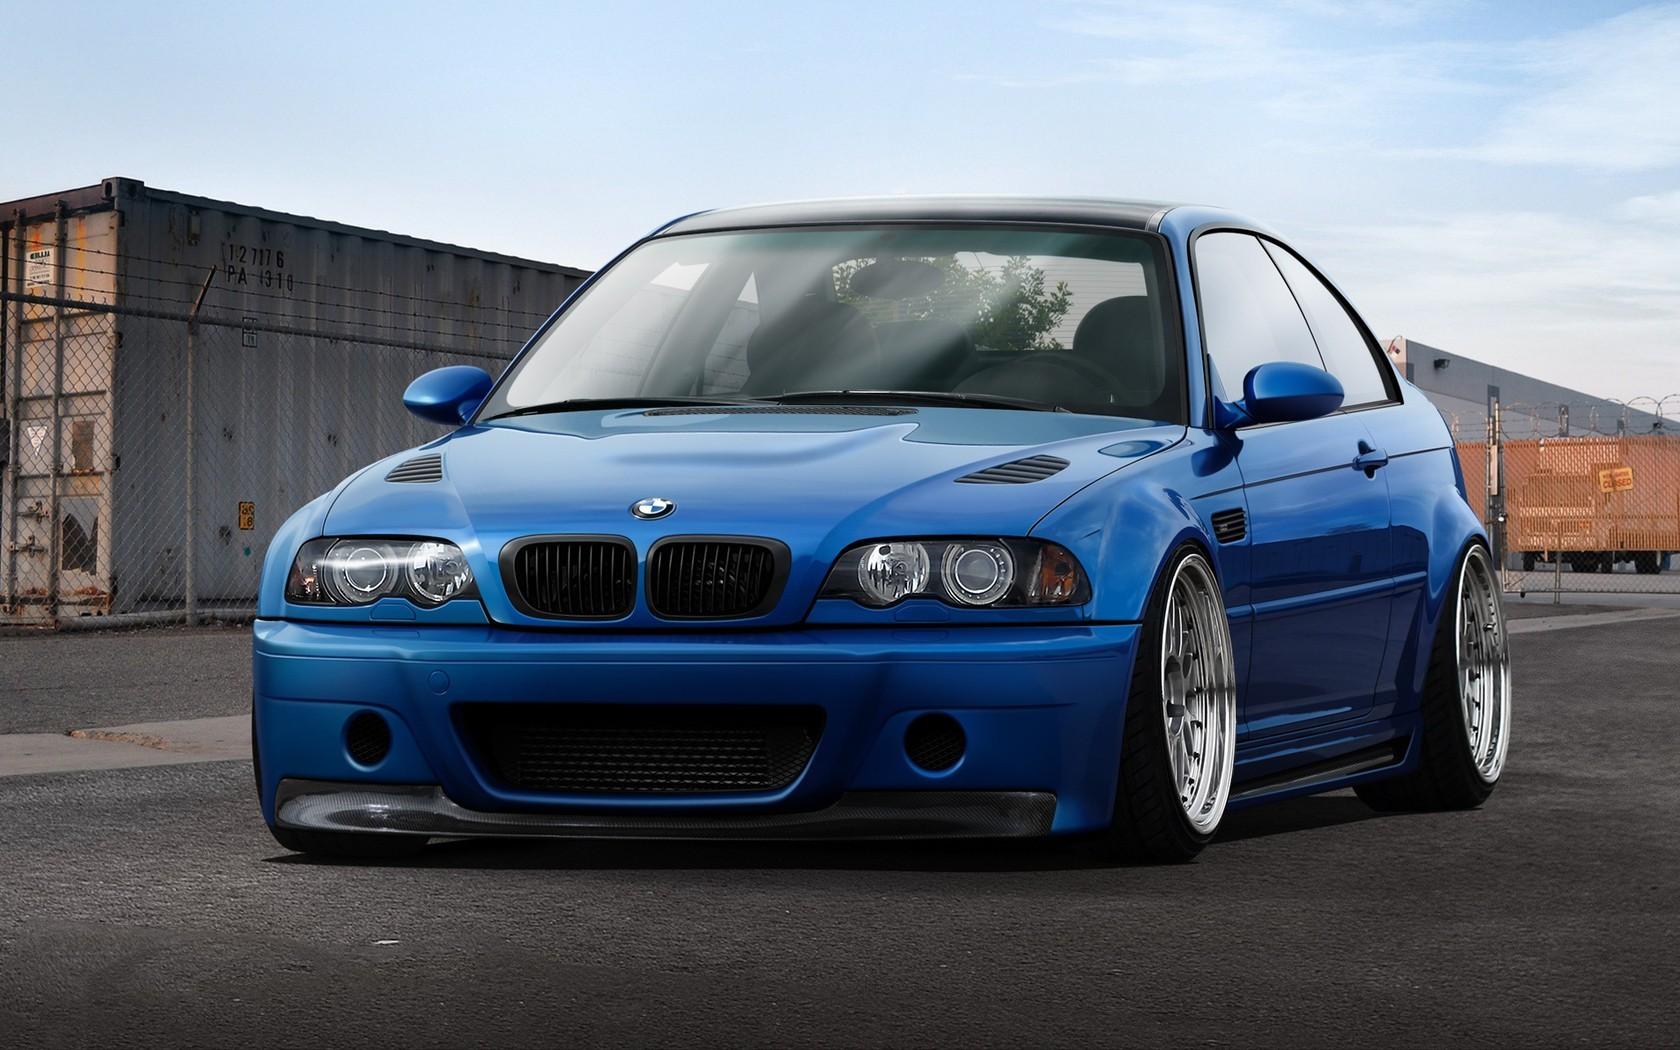 Sfondi Auto Blu Auto Sportiva Bmw M3 Bmw E46 Coupe